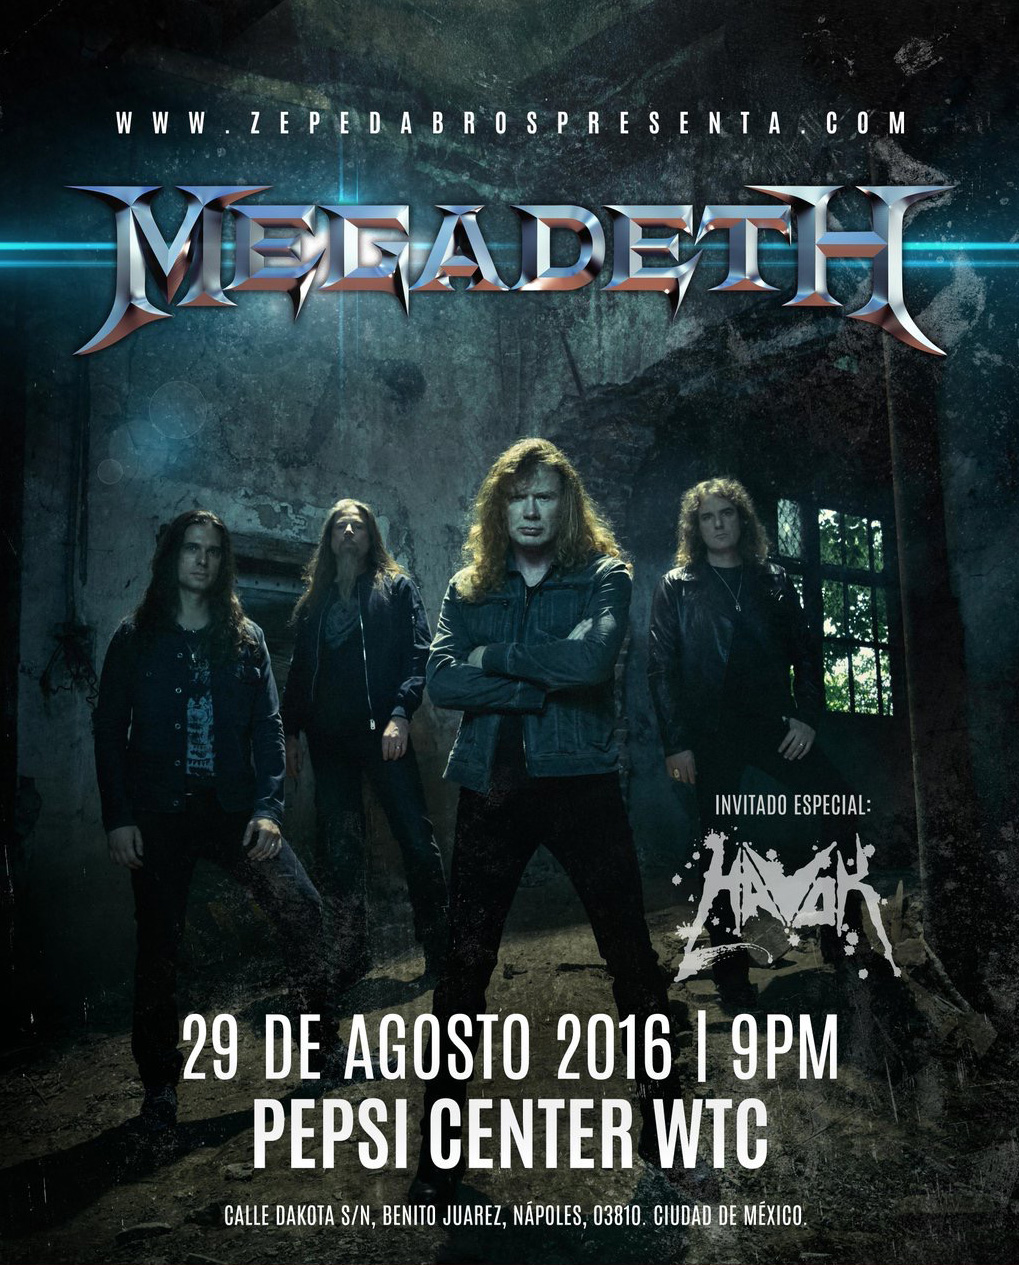 Megadeth_Pepsi_Center_2016